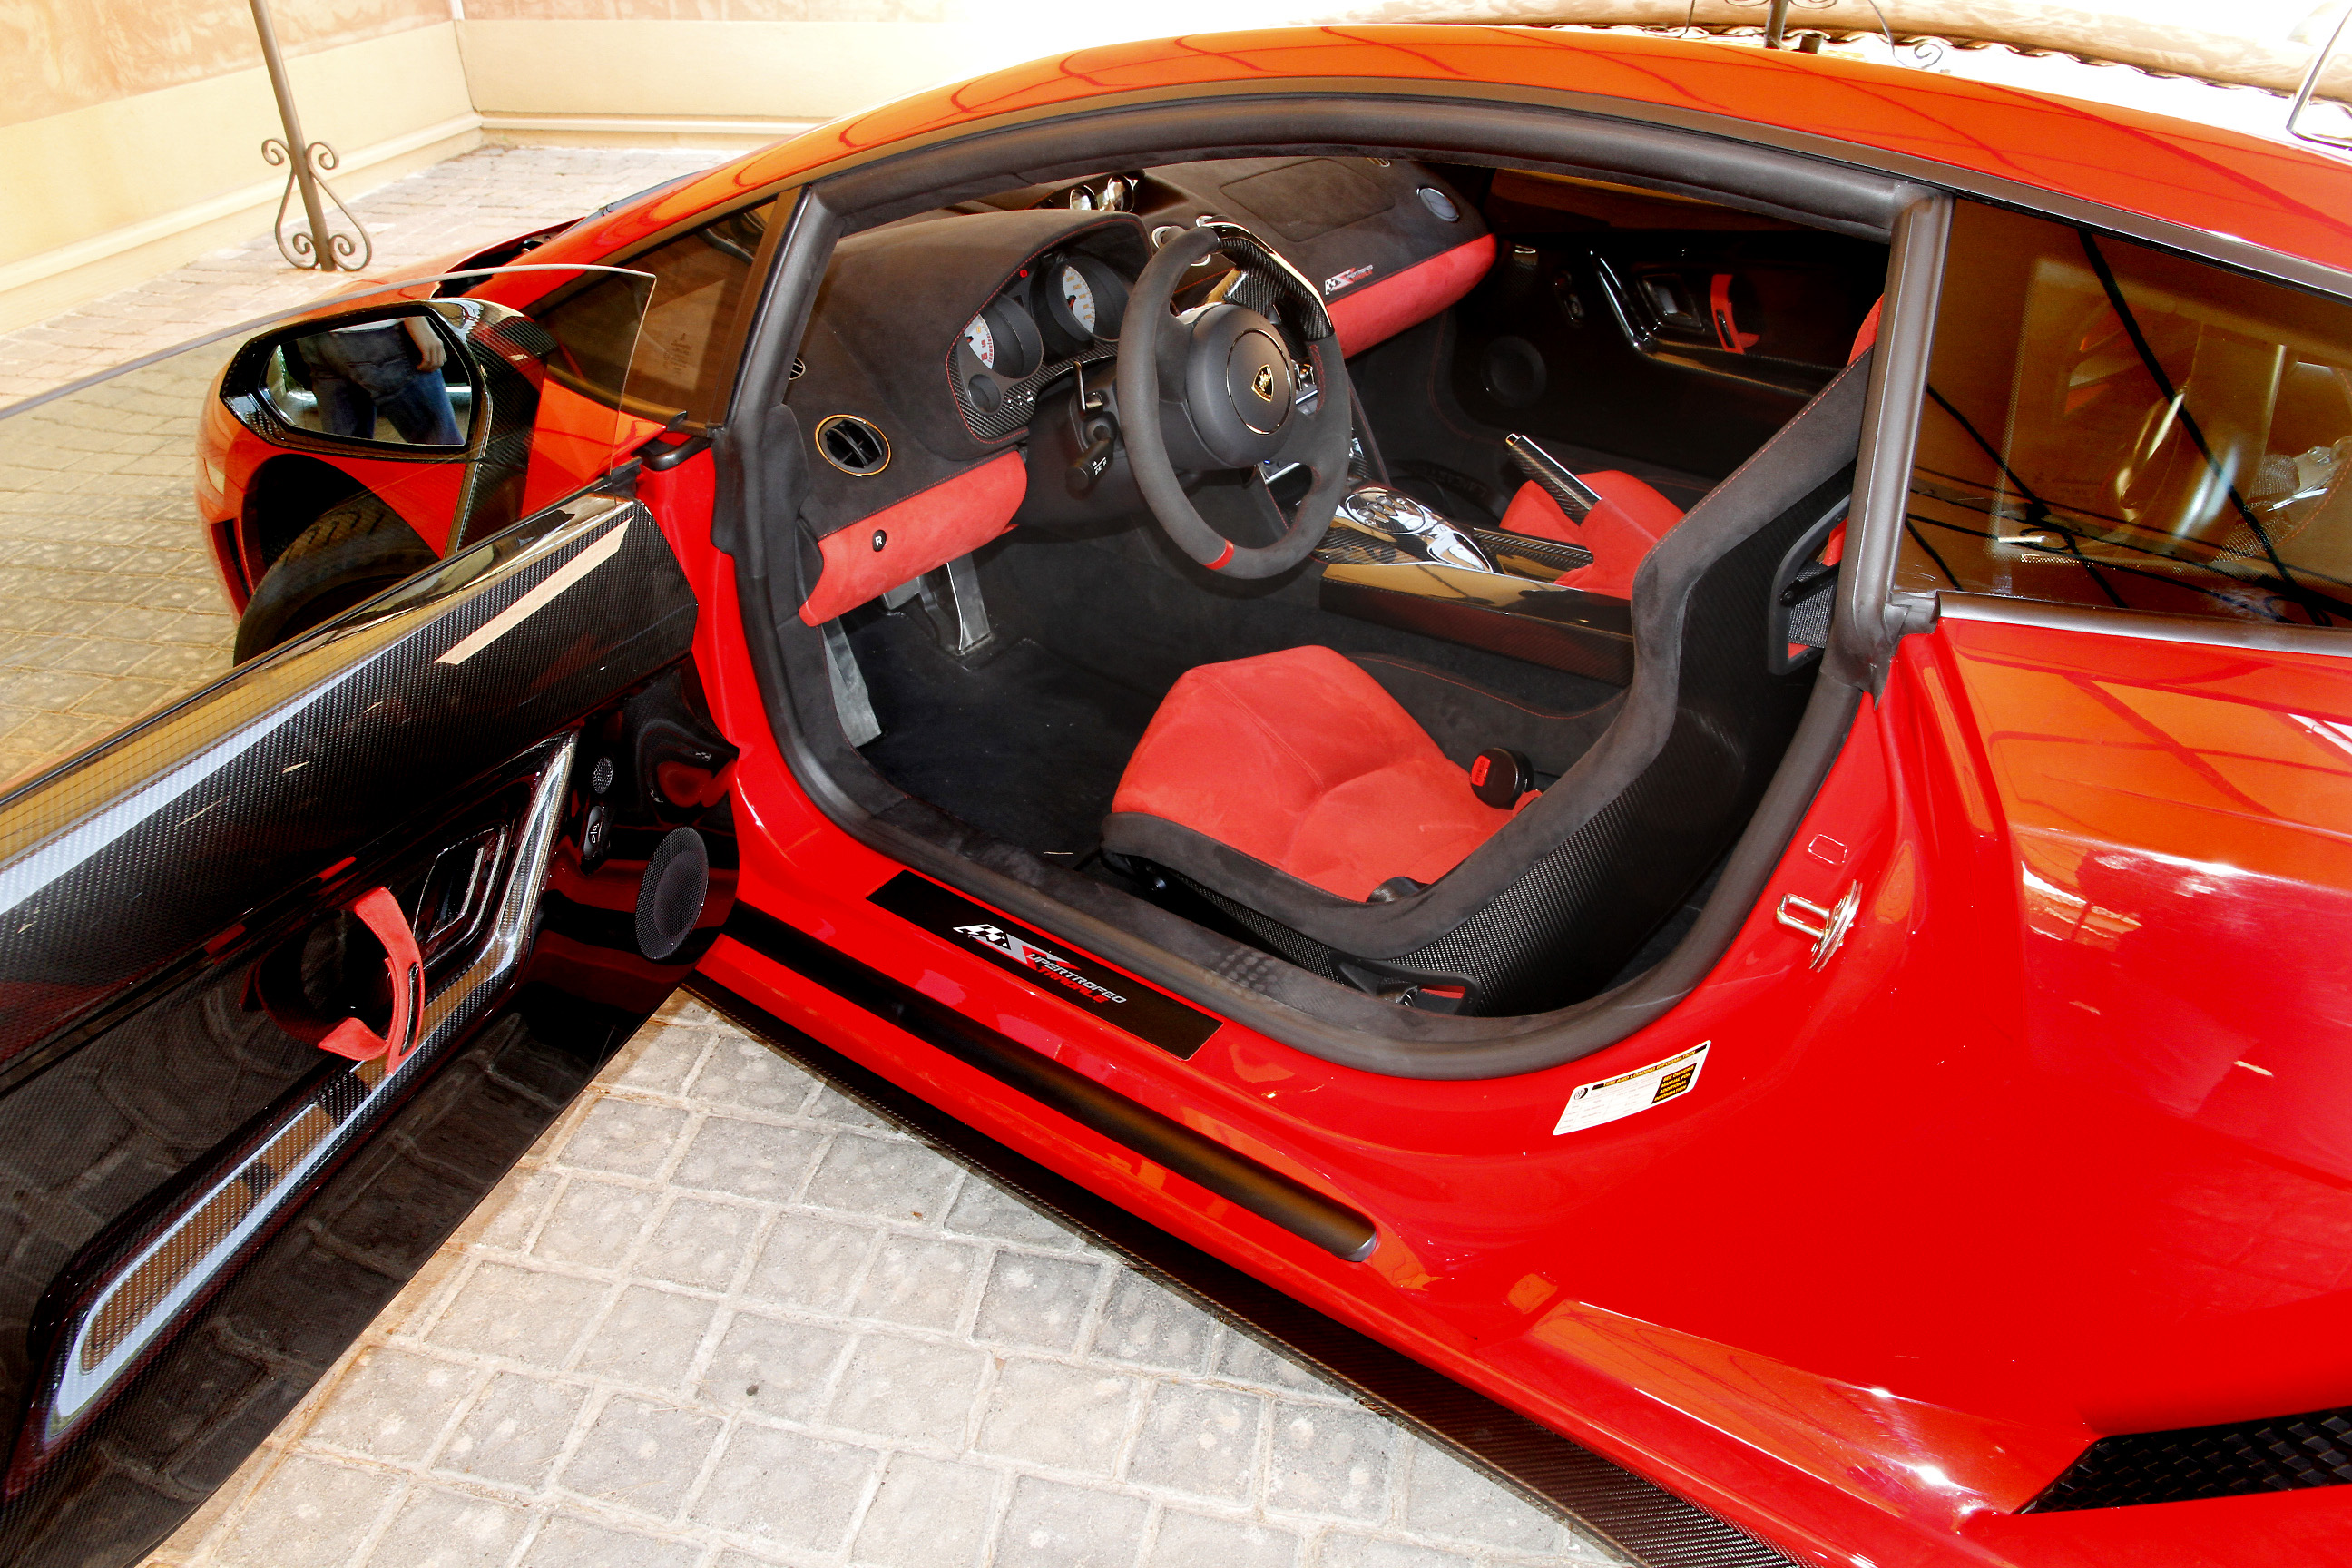 http://images.caradisiac.com/images/9/6/5/3/79653/S0-Prise-en-mains-Lamborghini-Gallardo-Super-Trofeo-Stradale-la-sortie-de-piste-266869.jpg